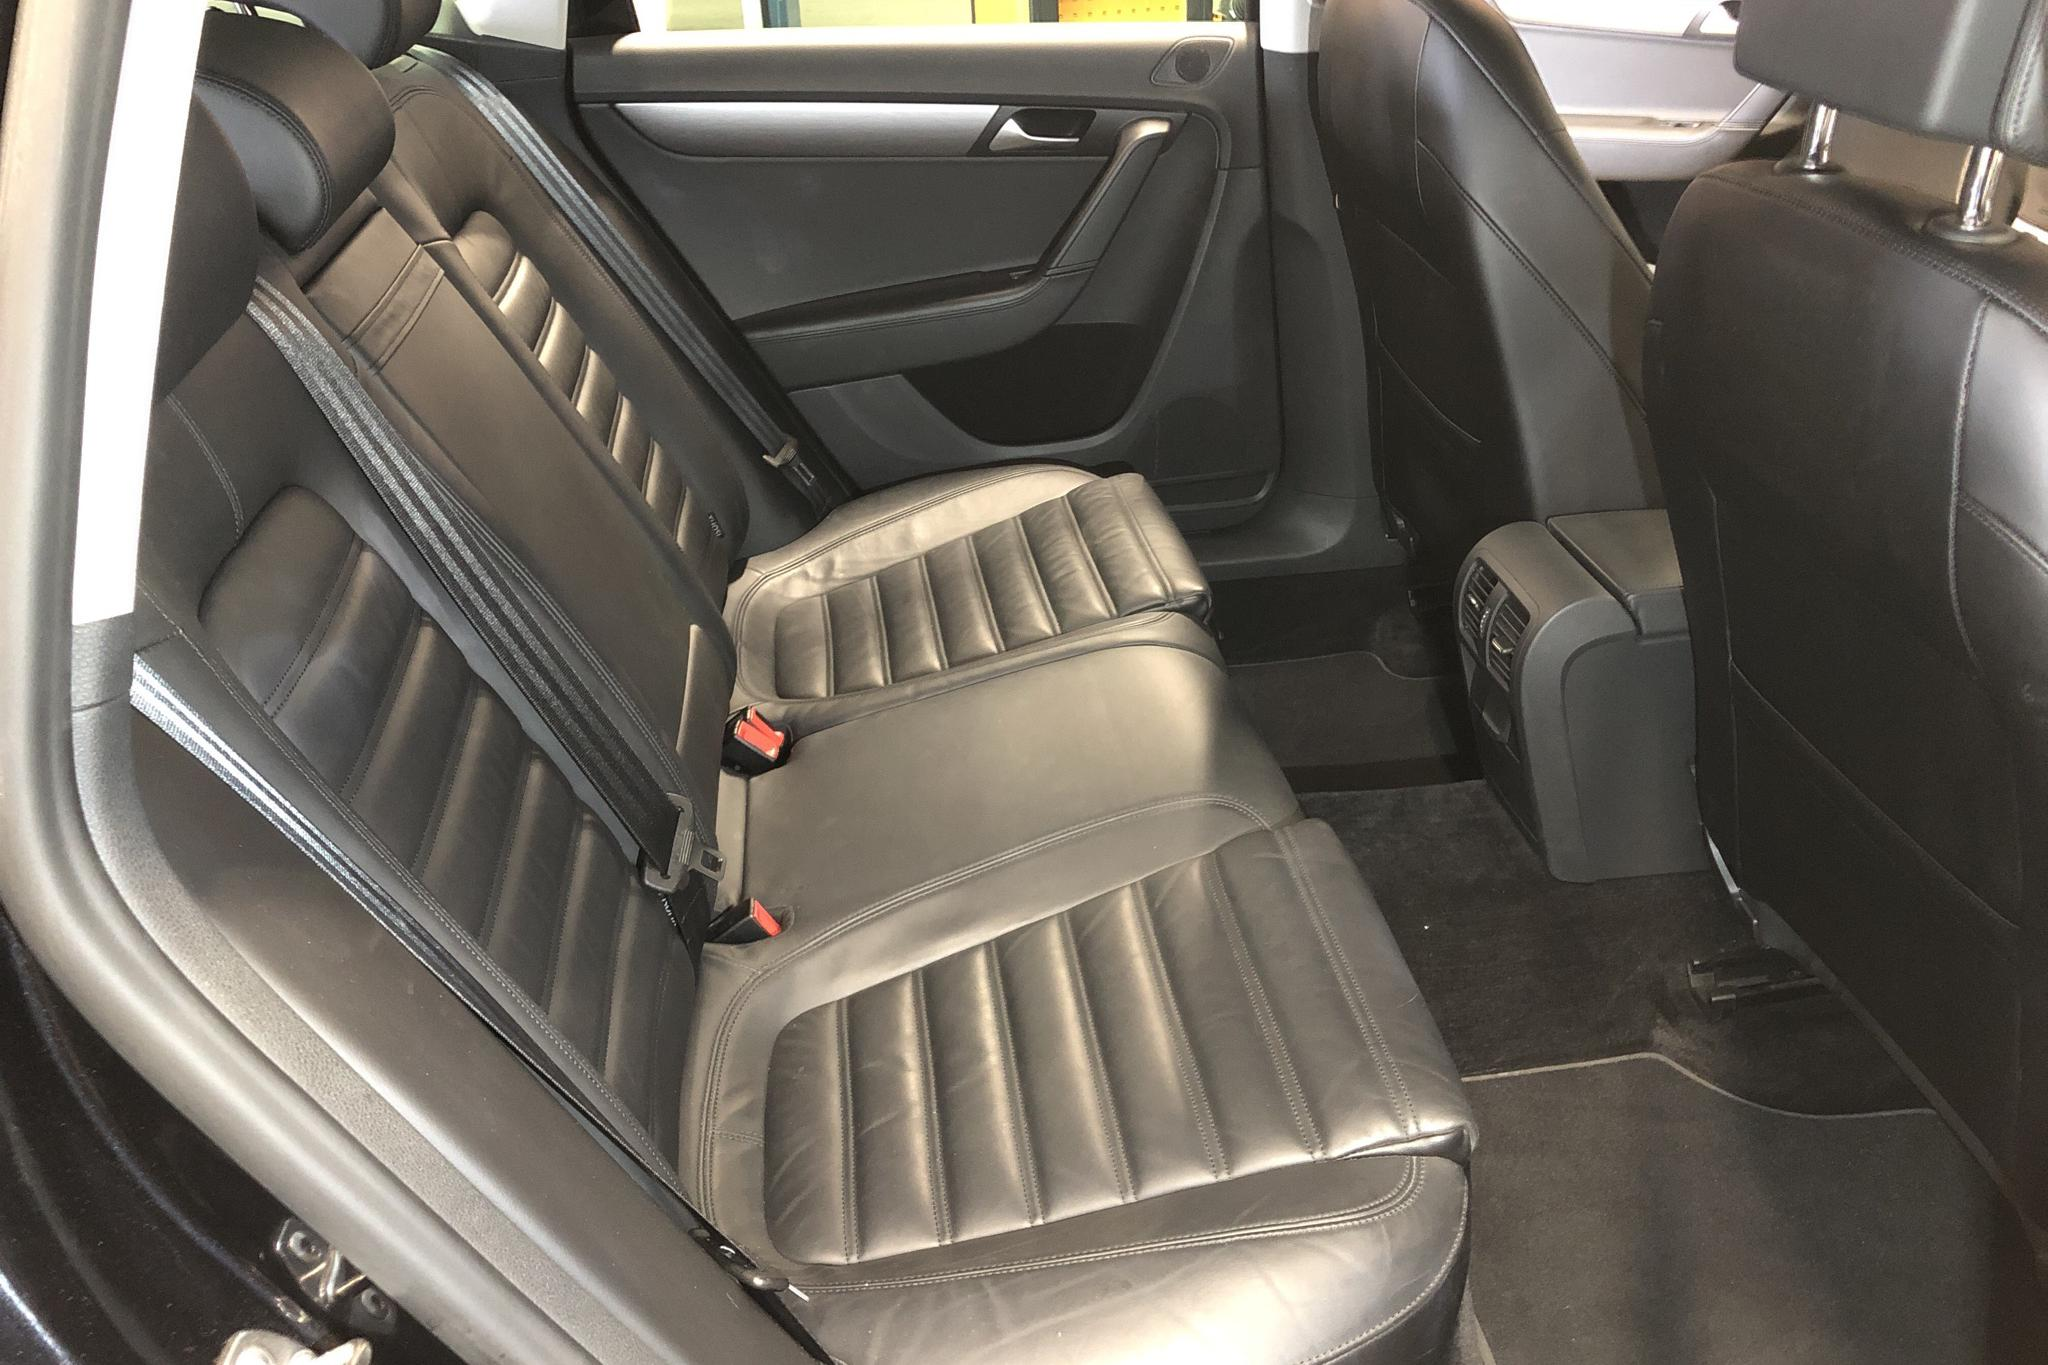 VW Passat 2.0 TDI BlueMotion Technology Variant 4Motion (177hk) - 13 823 mil - Automat - svart - 2013